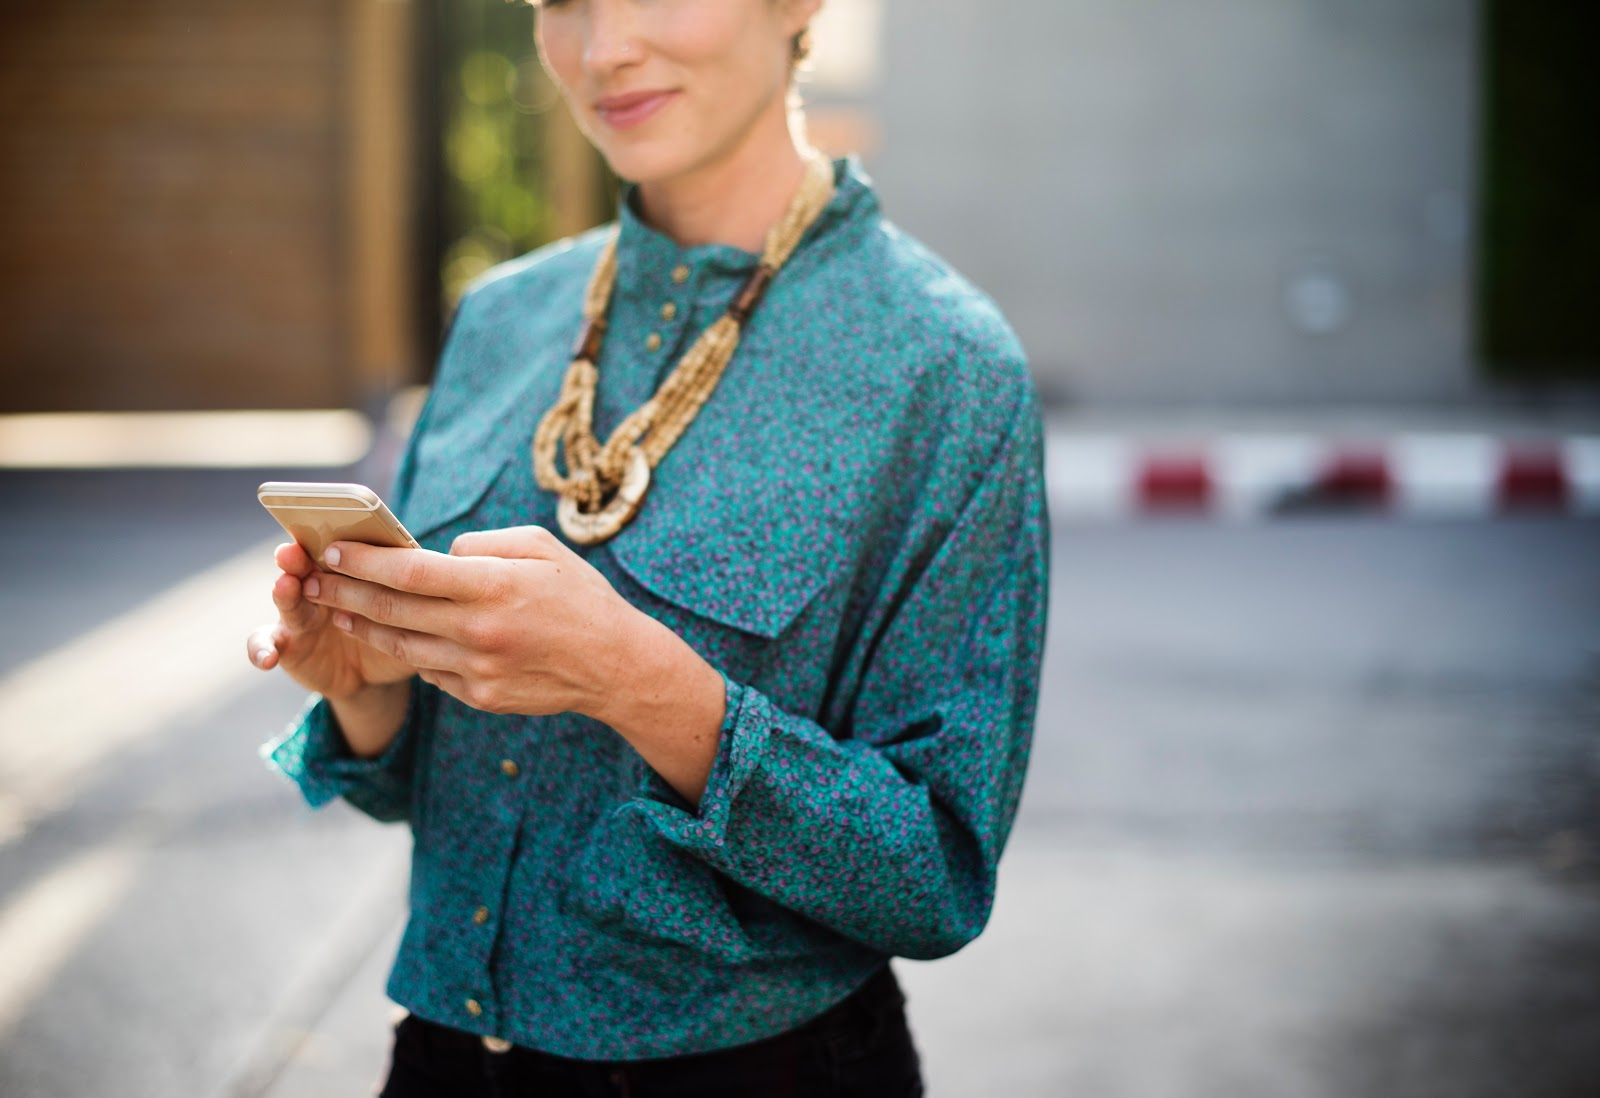 mobile retail, digital retail